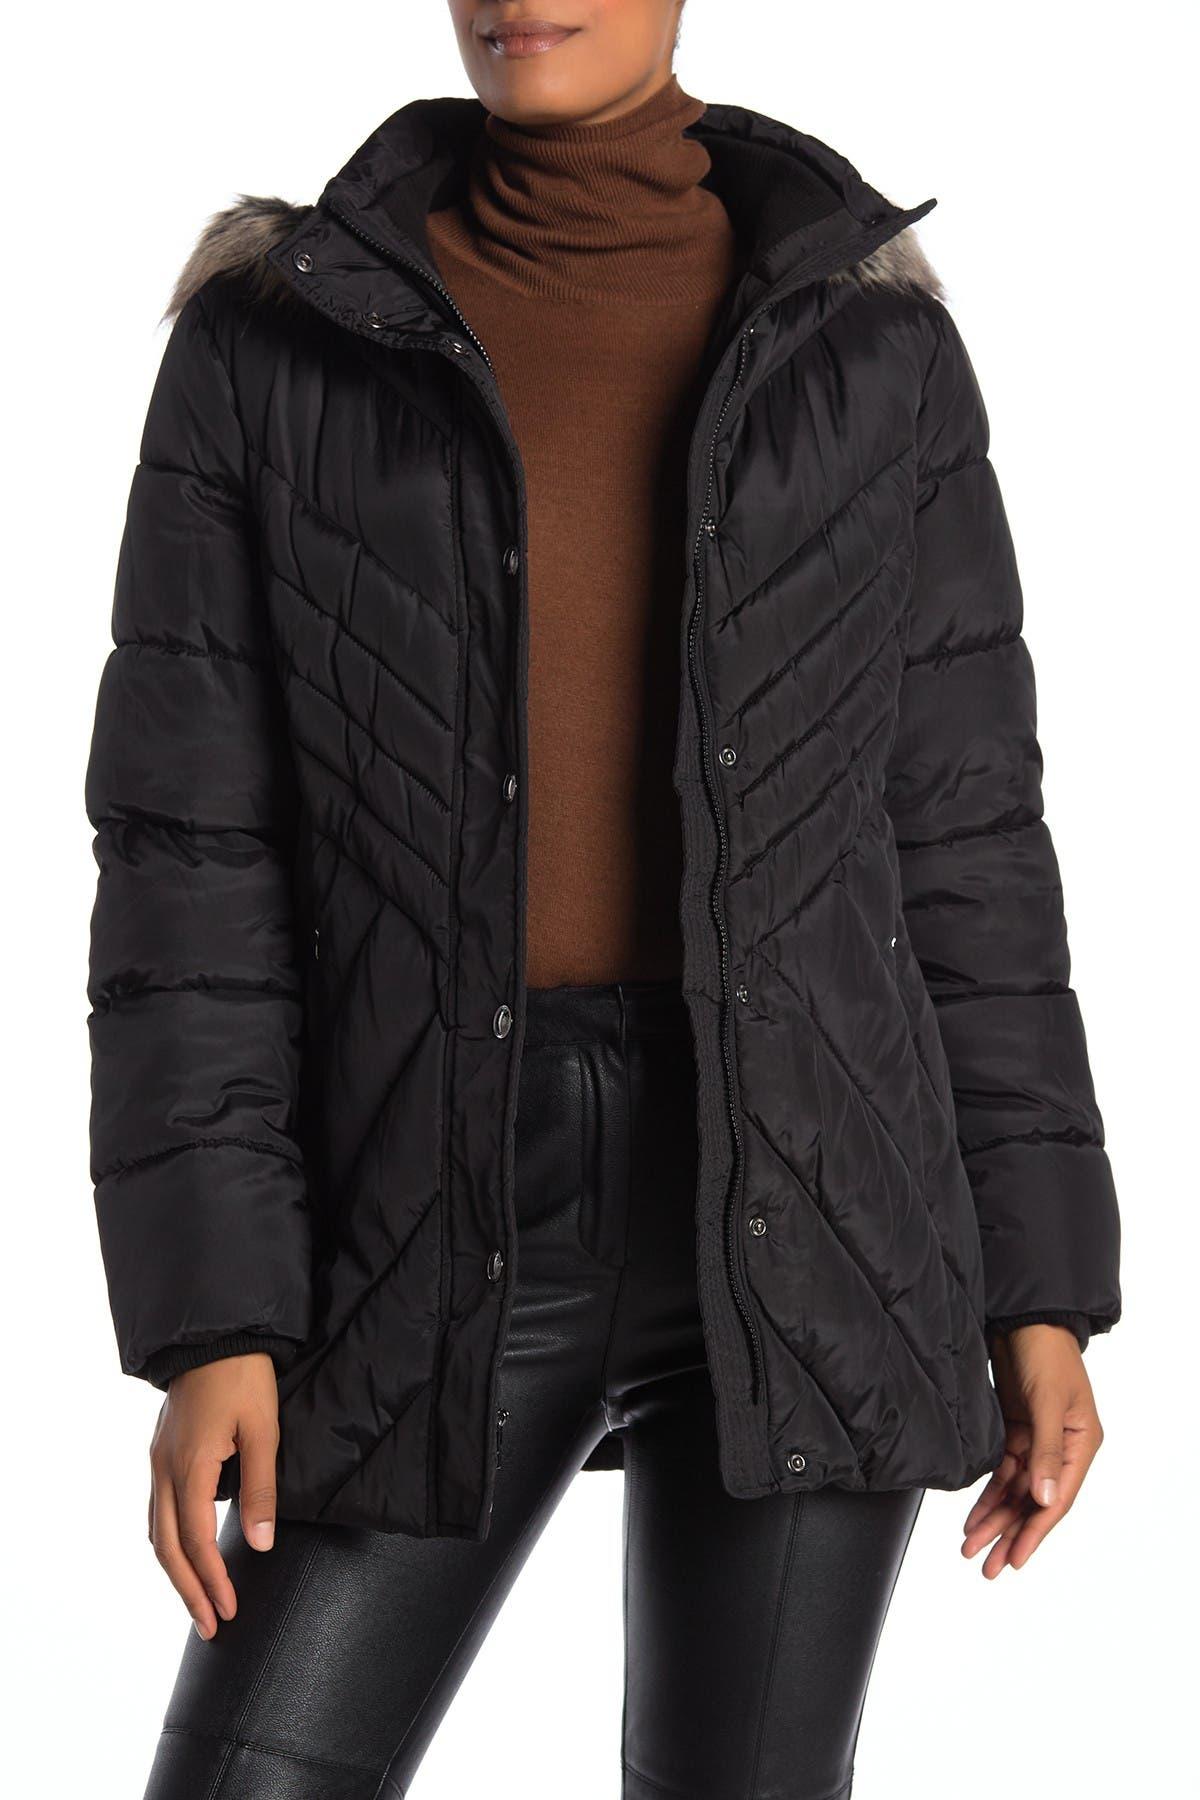 Image of London Fog Faux Fur Trim Hooded Zip Front Puffer Jacket